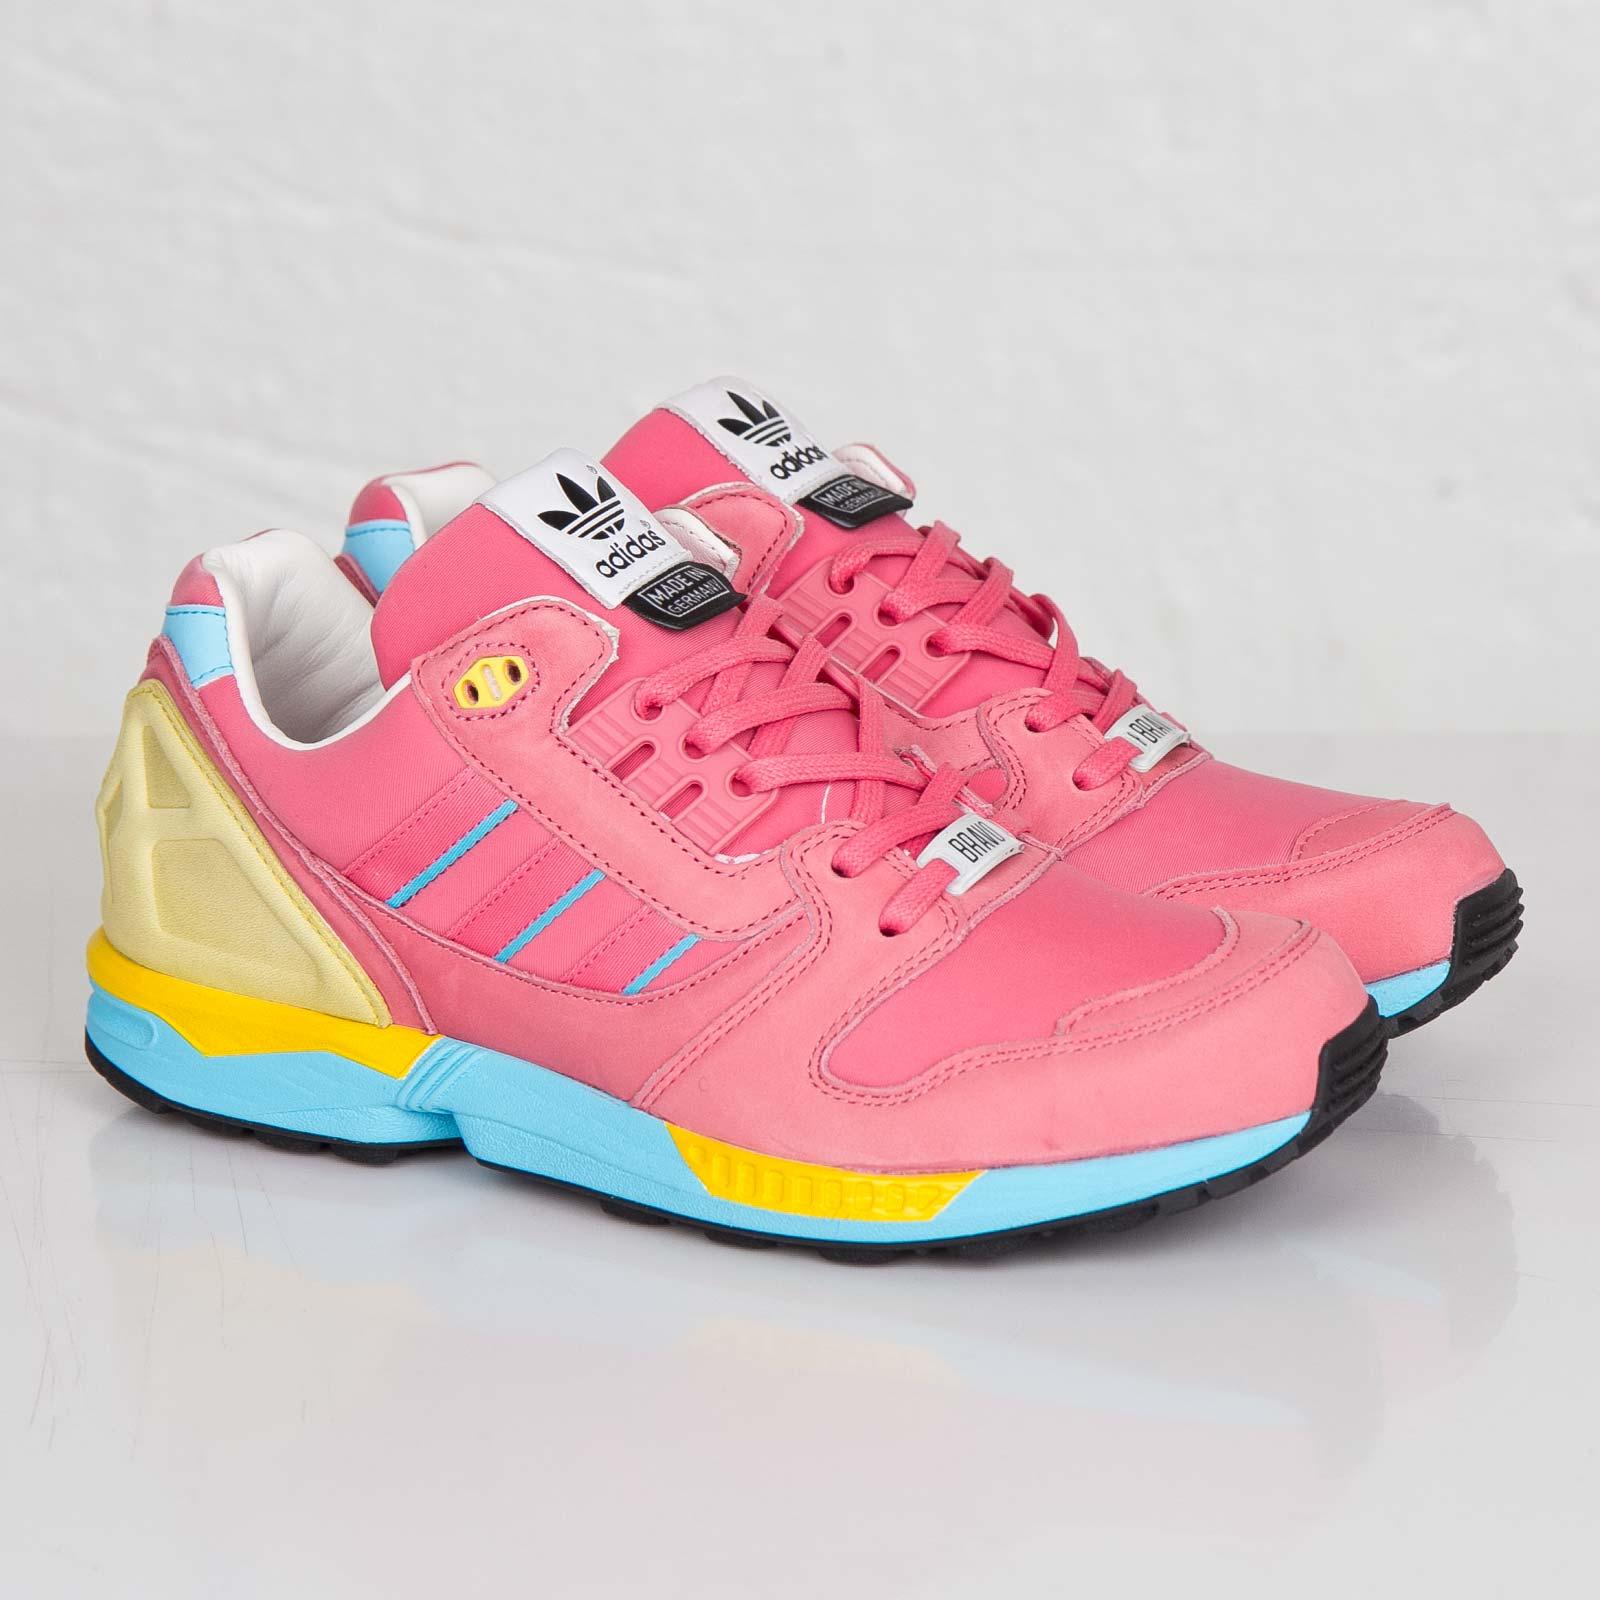 833bcd31a adidas ZX 8000 Bravo - M18629 - Sneakersnstuff